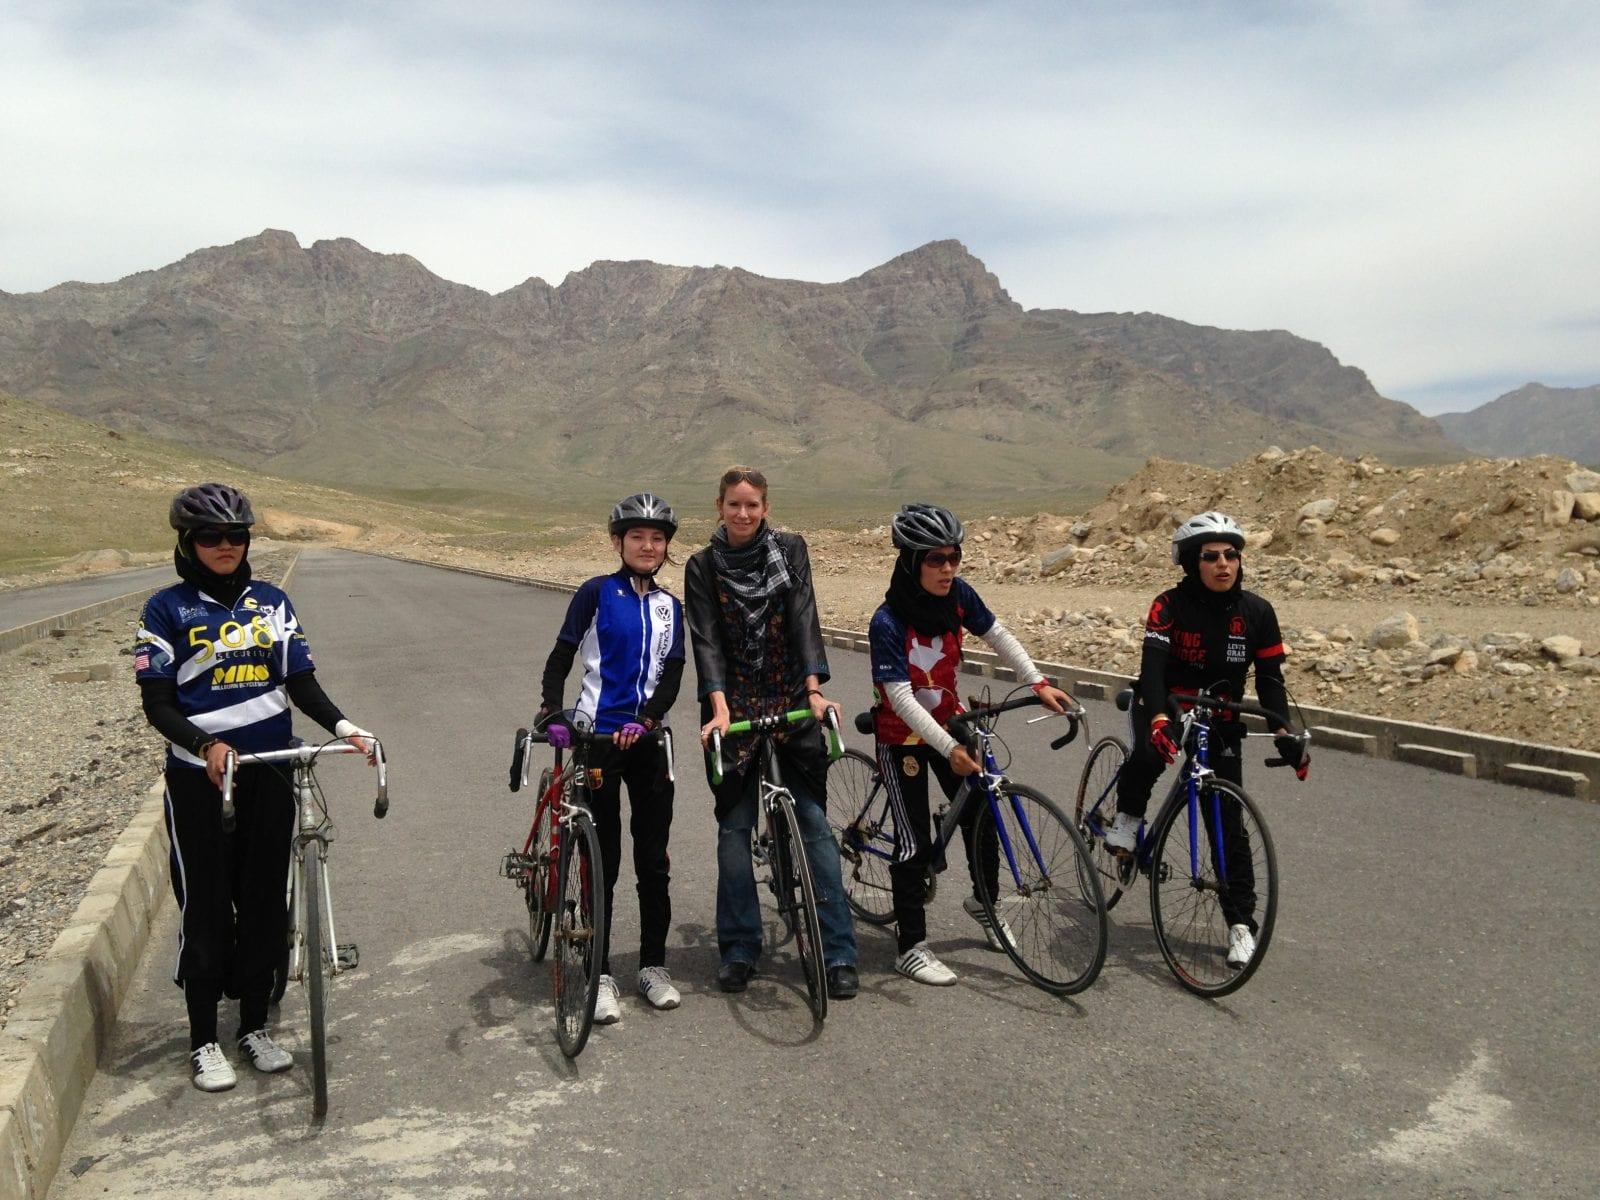 Afghanistan Shannon Galpin Mountain2Mountain © Photo:  Mountain2Mountain PR